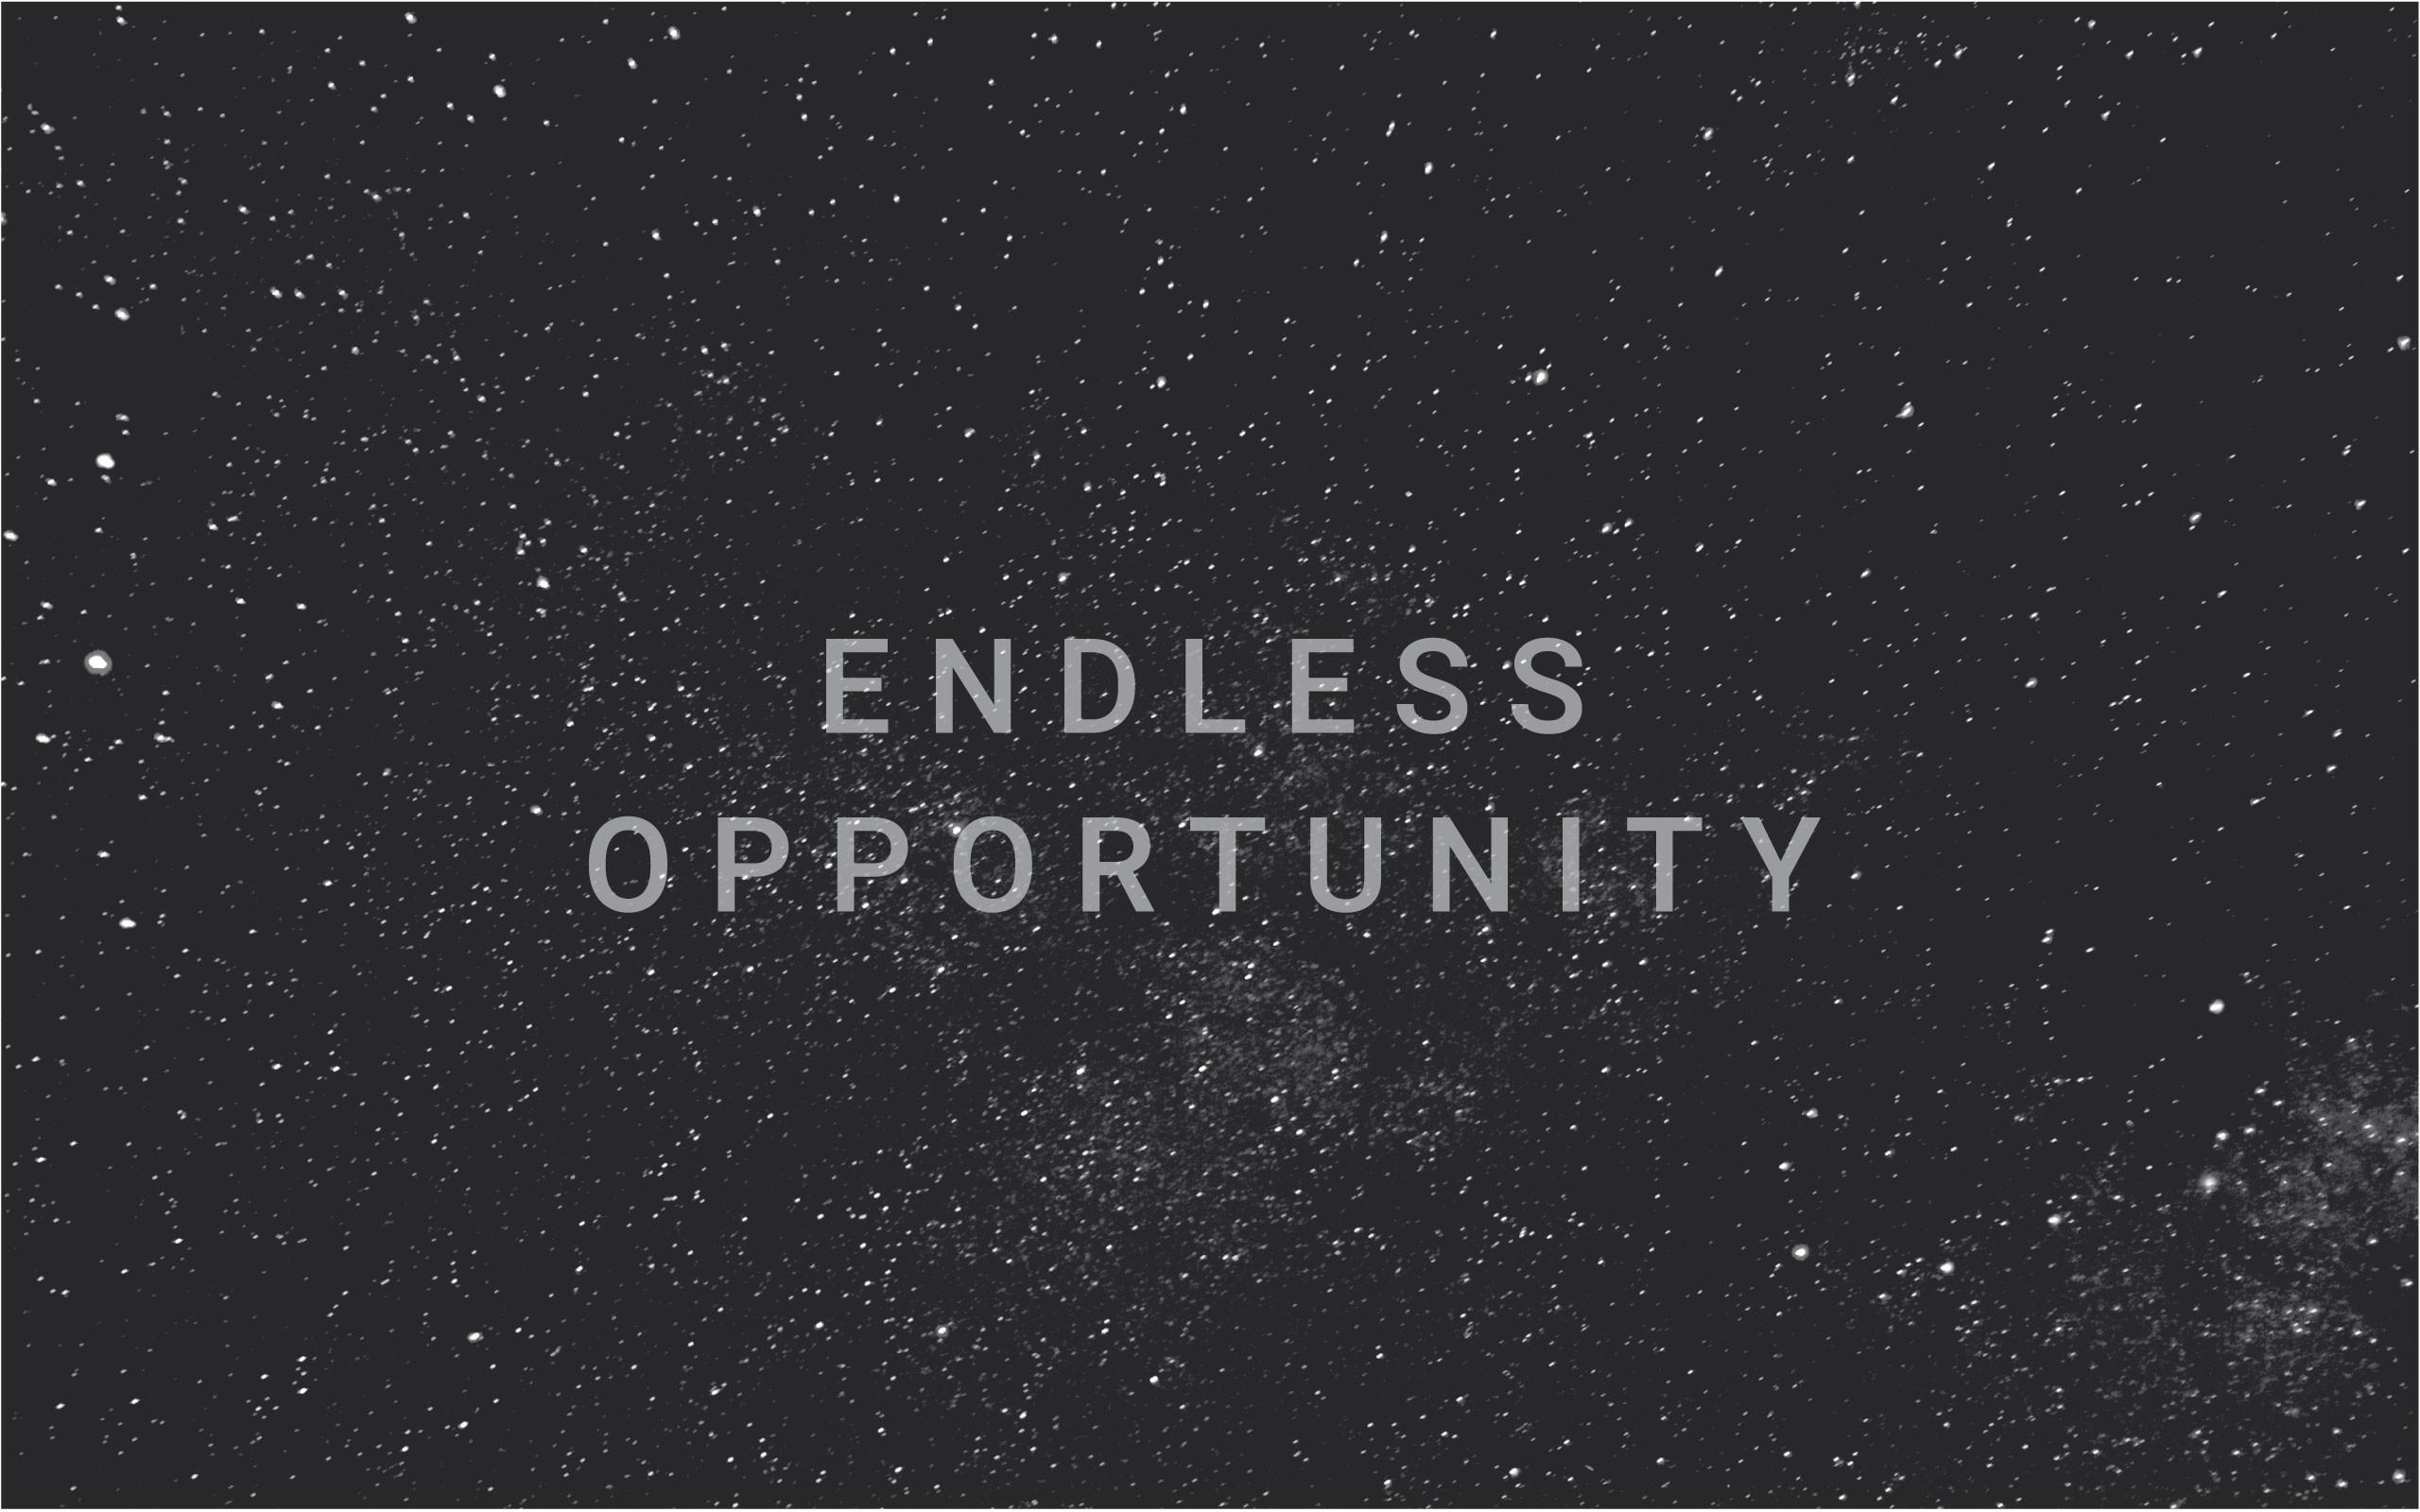 Endless.jpg 2,560×1,600 pixeles